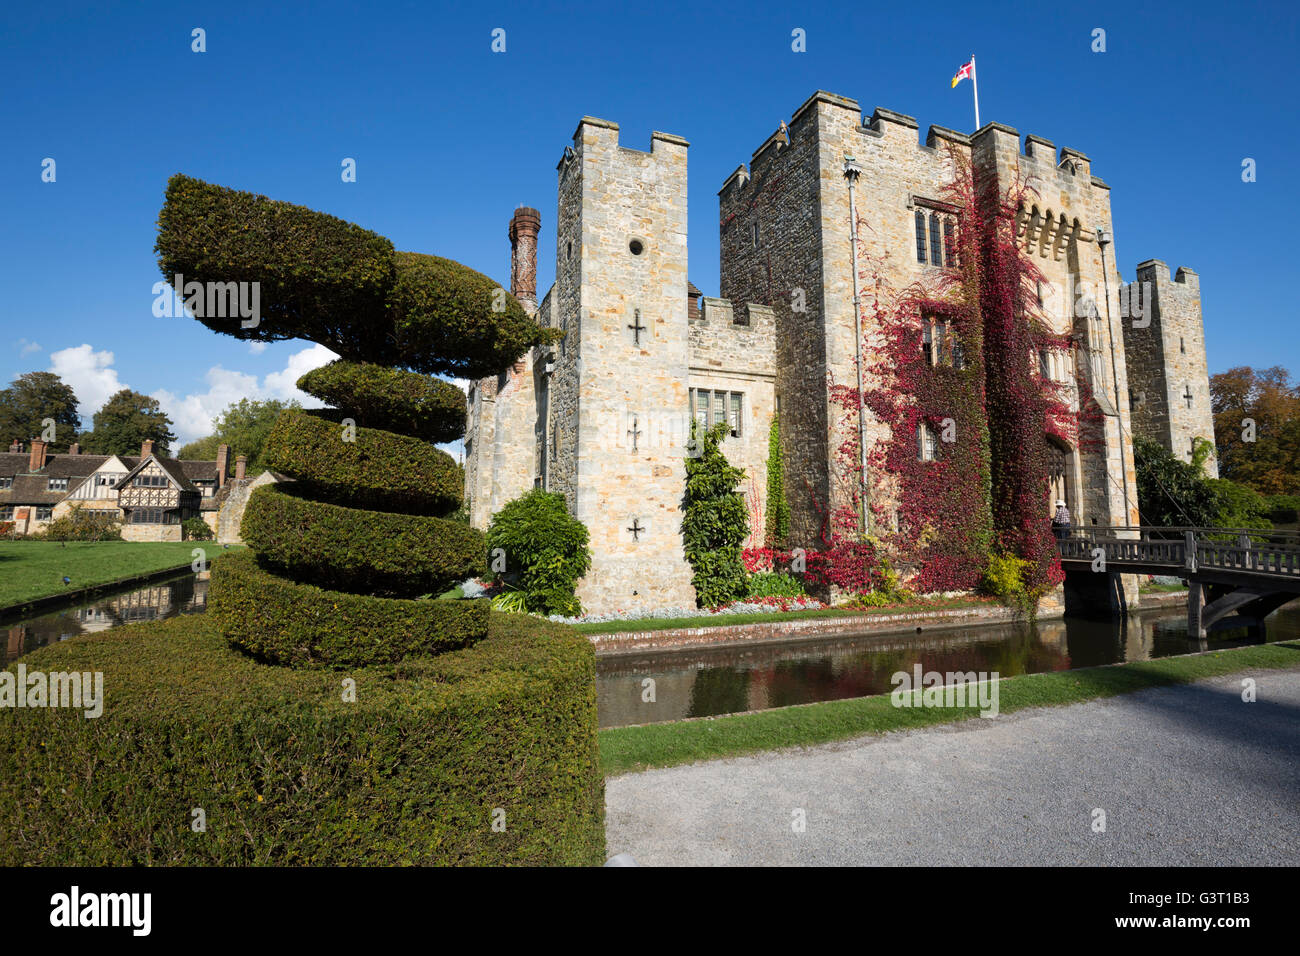 Le château de Hever et jardins, Hever, Kent, Angleterre, Royaume-Uni, Europe Photo Stock